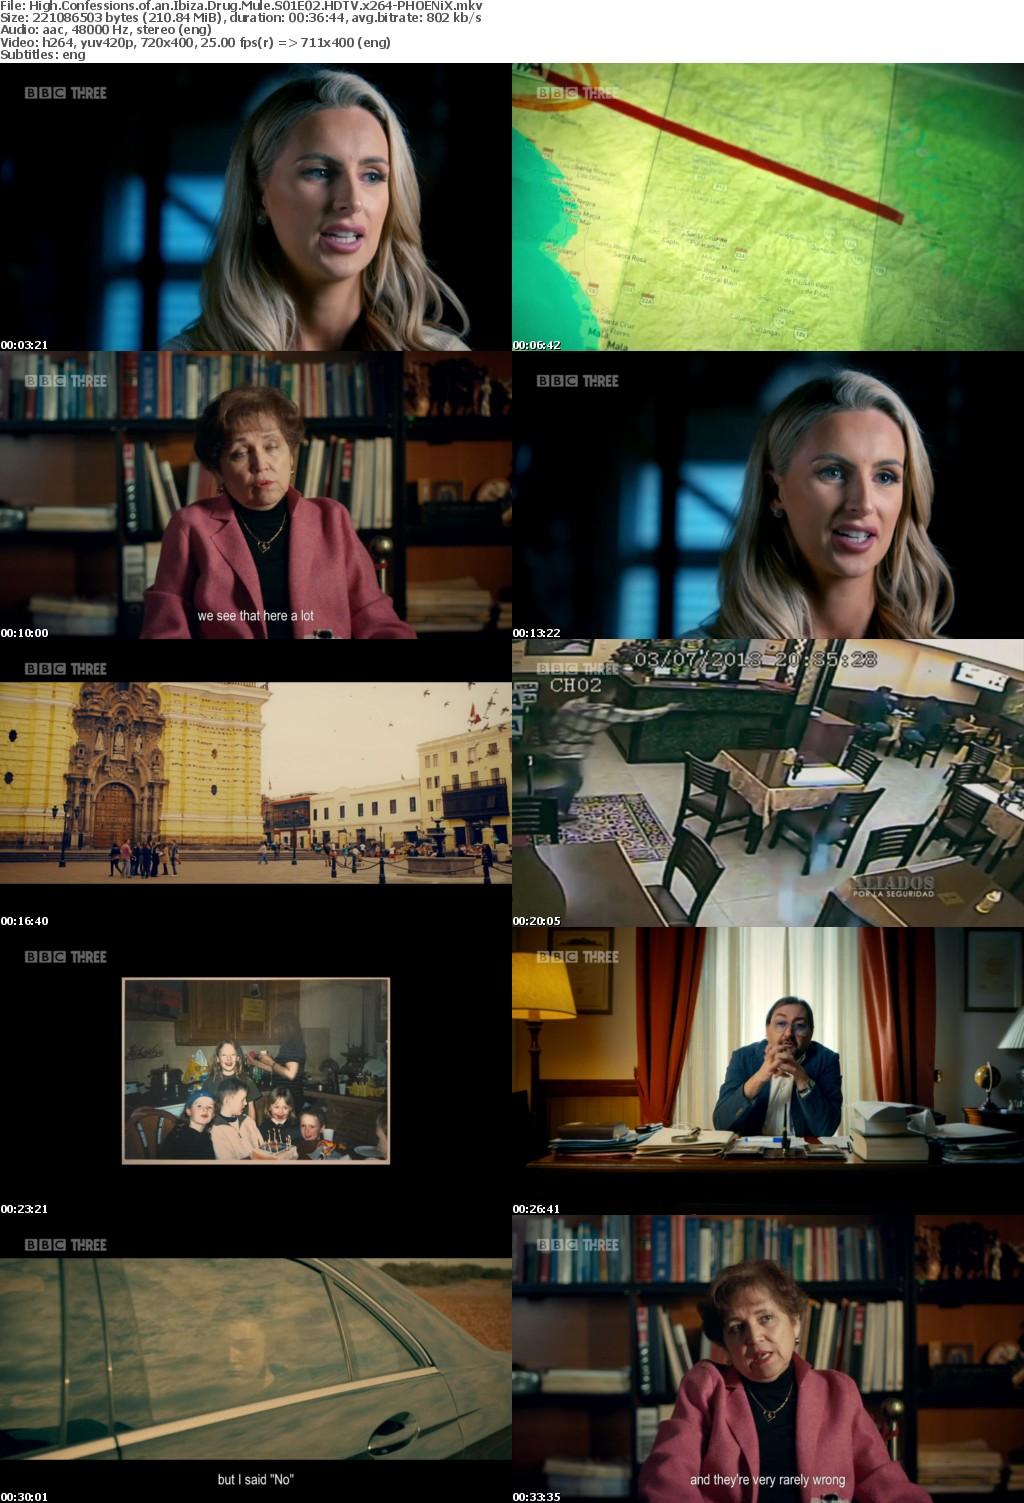 High Confessions of an Ibiza Drug Mule S01E02 HDTV x264-PHOENiX